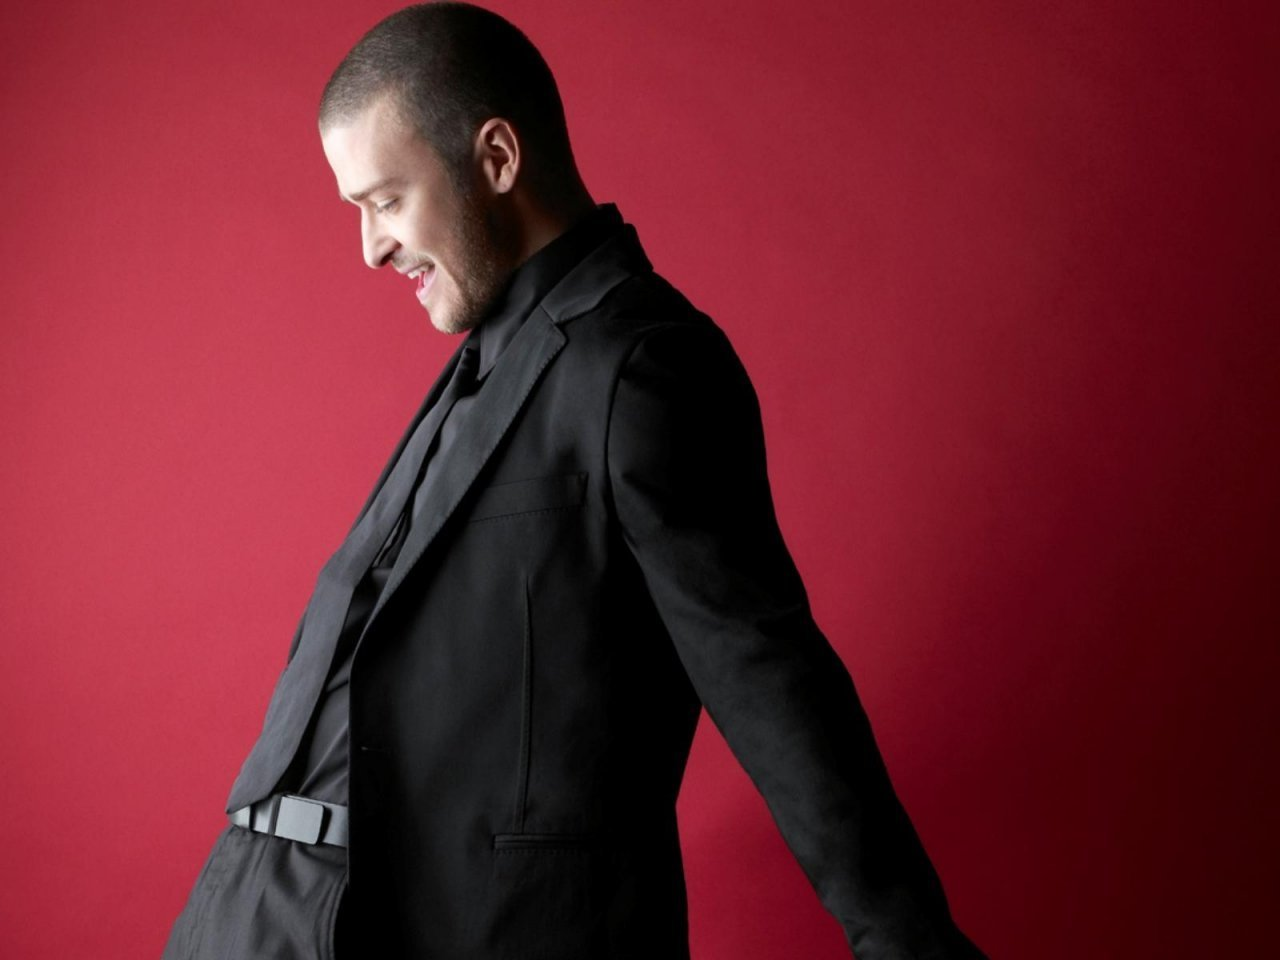 J.T. - Justin Timberlake Wallpaper (19104298) - Fanpop